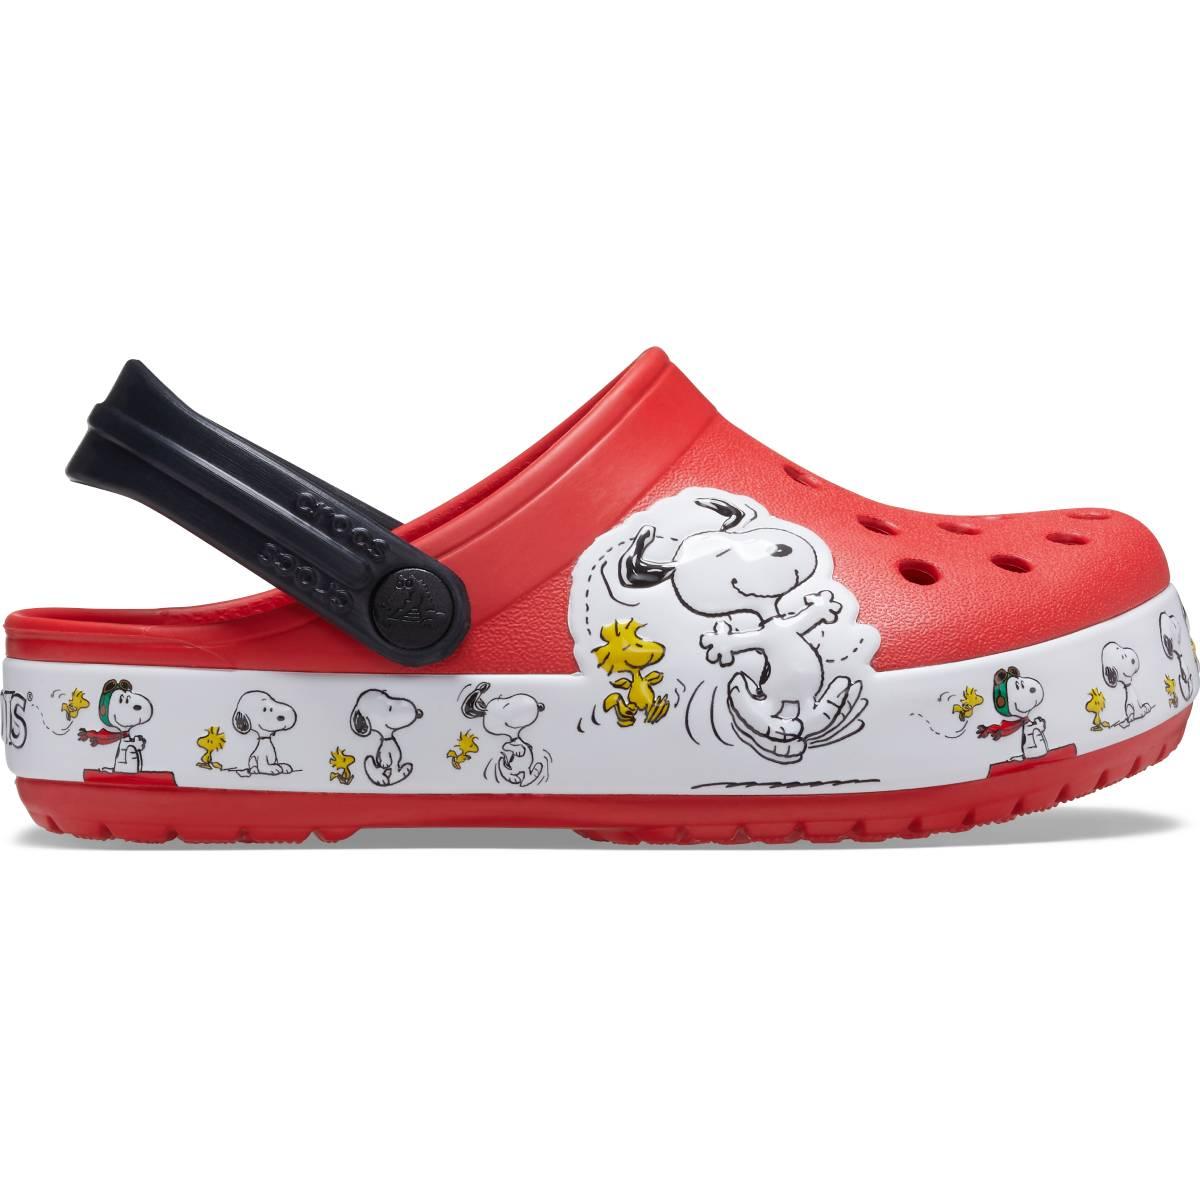 Crocs FL Snoopy Woodstock Cg K